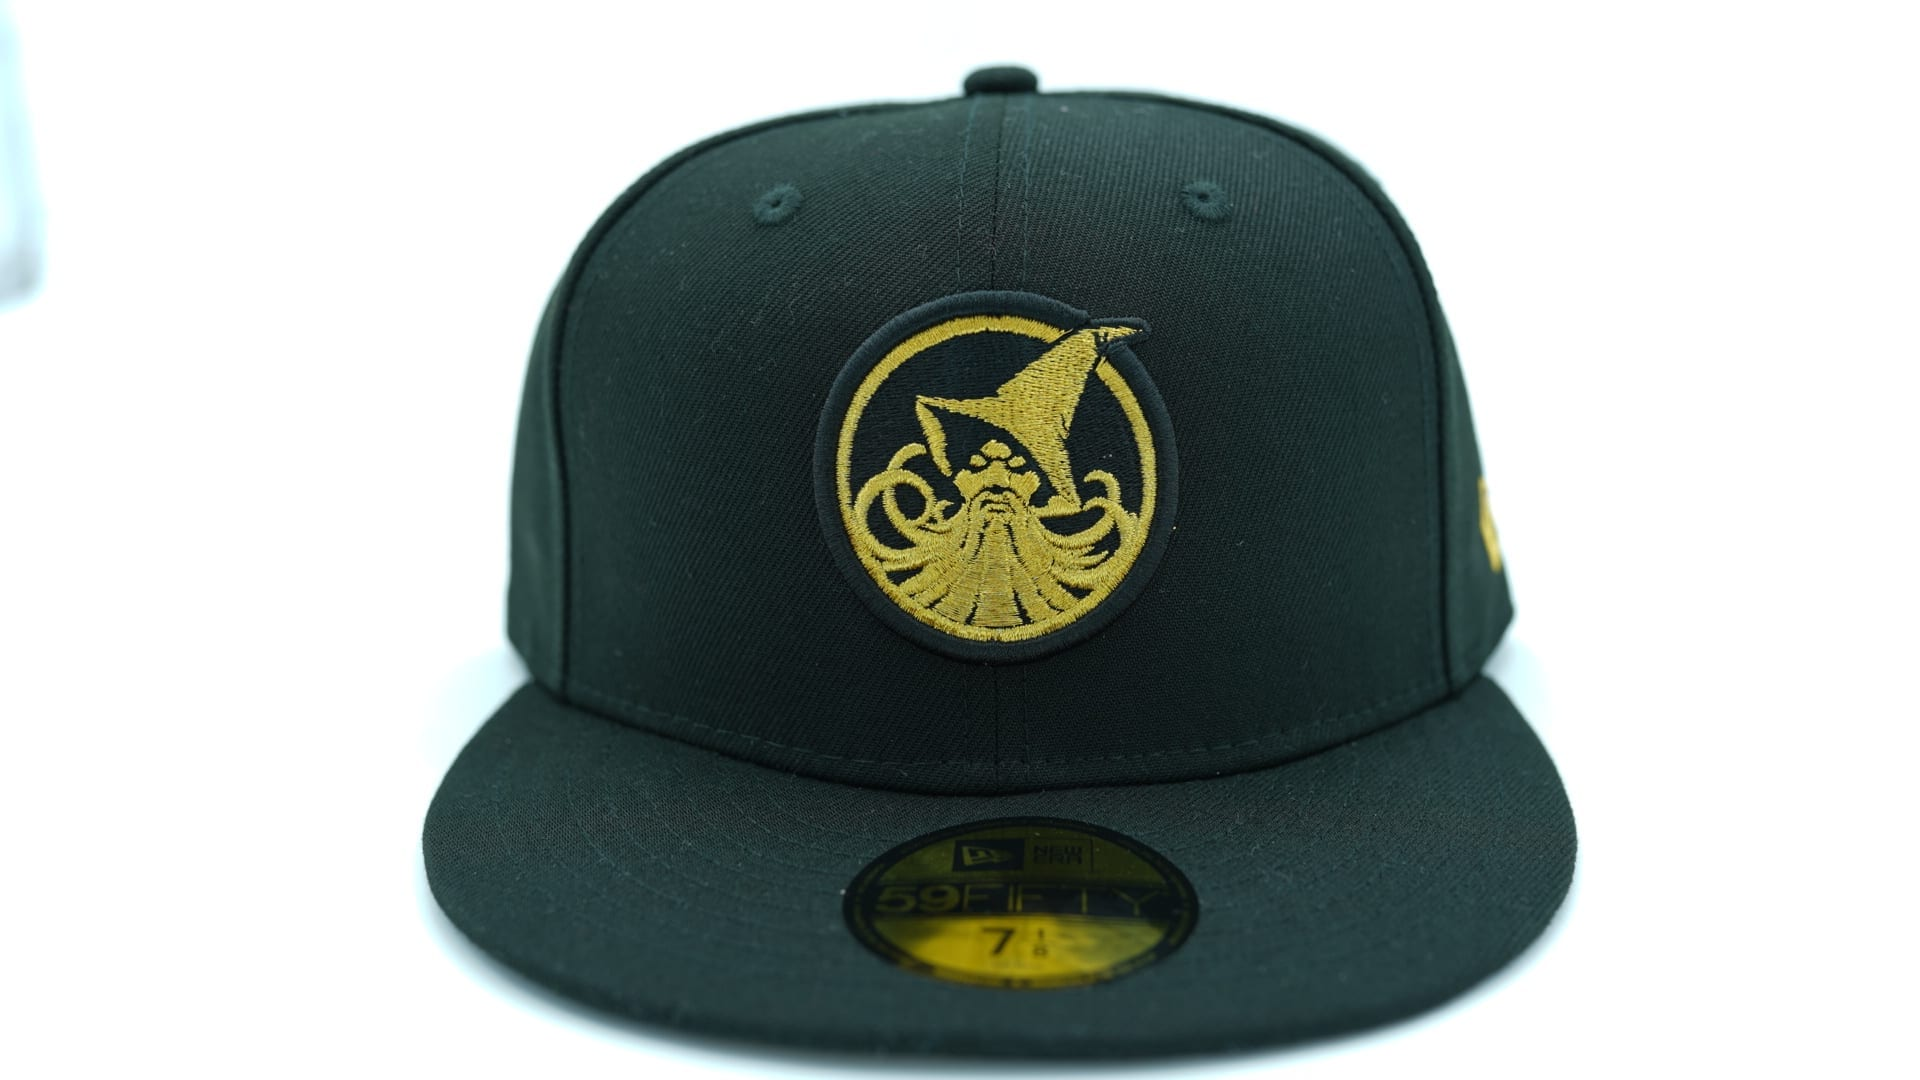 new era x npb tokyo giants 59fifty fitted baseball cap